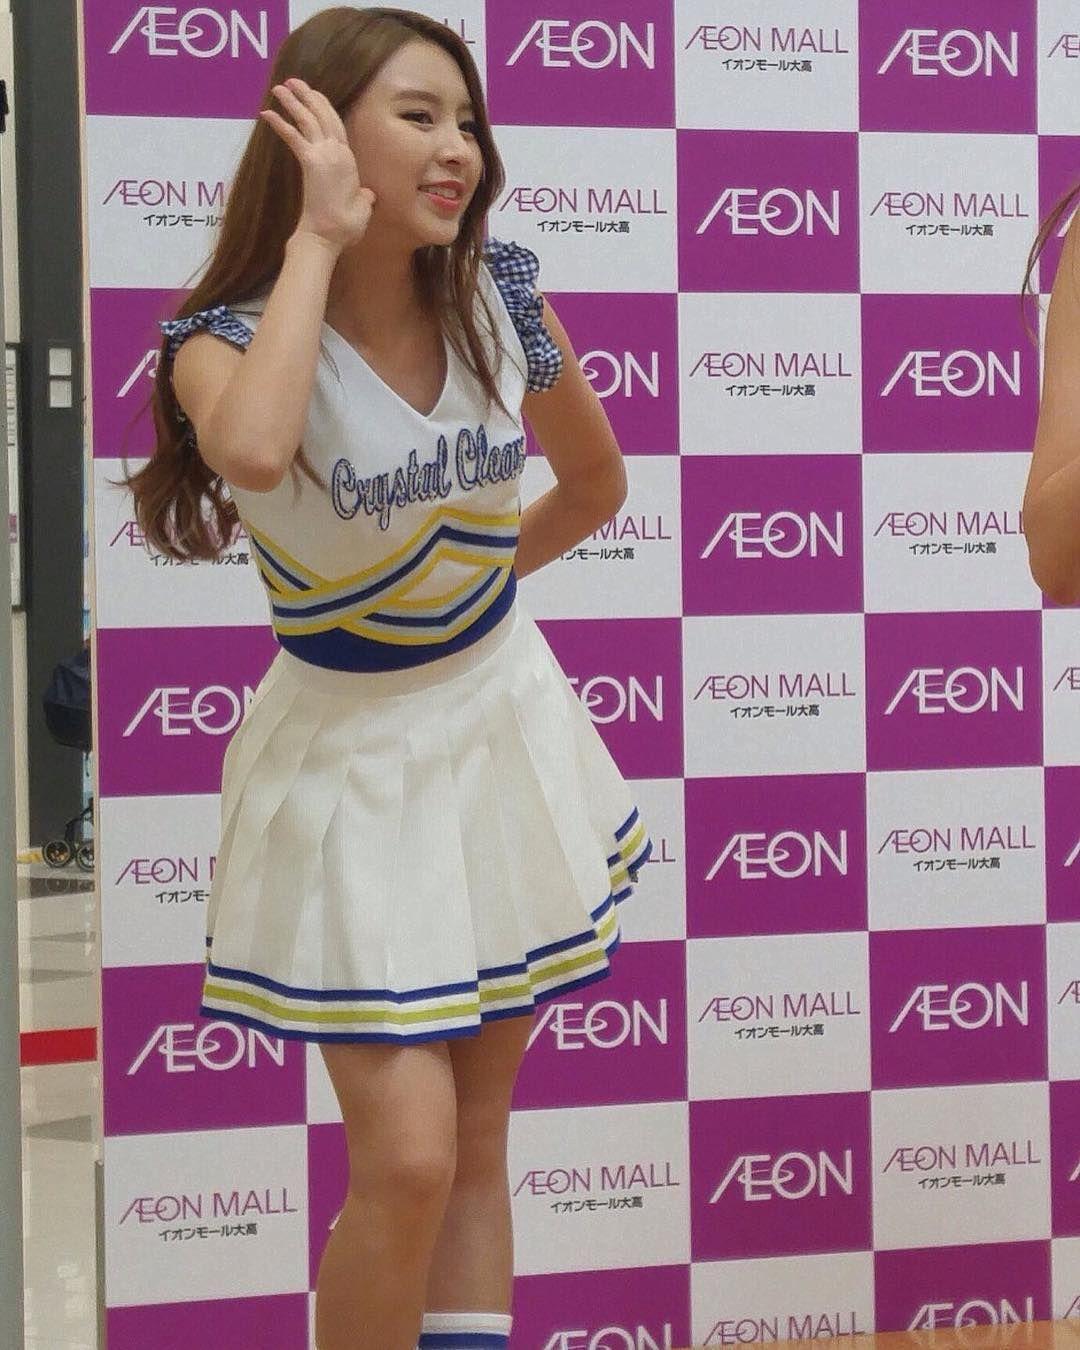 [16.07.16] @ Aeon Release Event ---------------------------------------------- #CrystaLClear #CLC #Kpop #CubeEntertainment #Sorn #Yeeun #Yujin #Seugyeon #Seunghee #RookieGroup #GirlGroup #씨엘씨 #Elkie #ElkieChong #CLCElkie #ChongTingYan #Eunbean #Kwoneunbean #clckwonbean #KwonEunbin #Eunbin #莊錠欣 #엘키 #손 #오승히 #예은 #은빈 #승연 #유진#チャミスマ